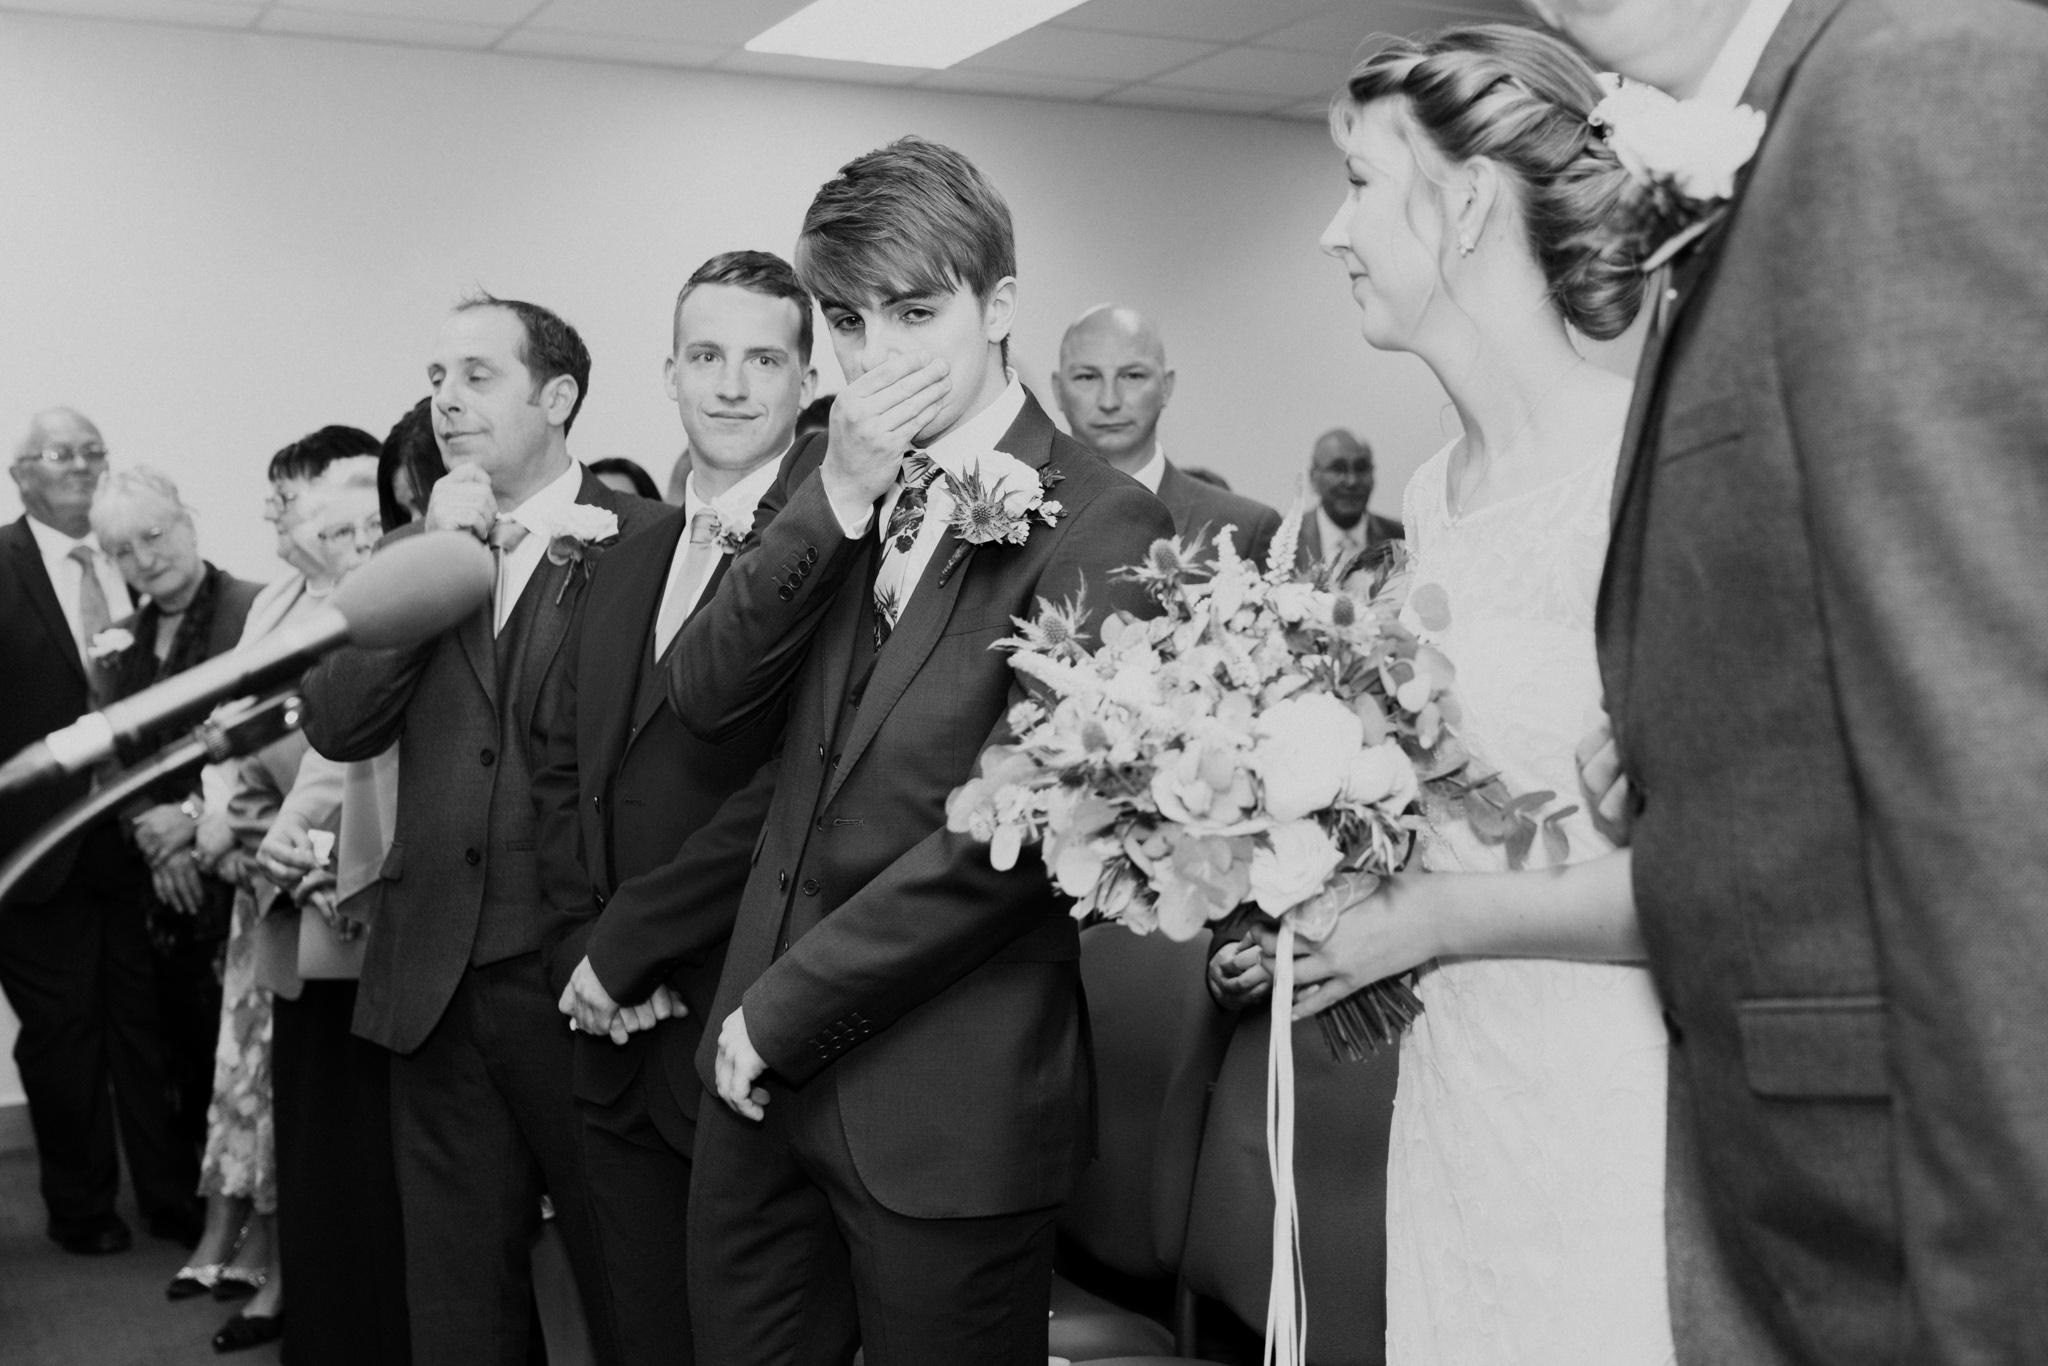 Jess-and-Tom-Norfolk-Alternative-Wedding-Essex-Wedding-Photographer-Grace-Elizabeth-10.jpg